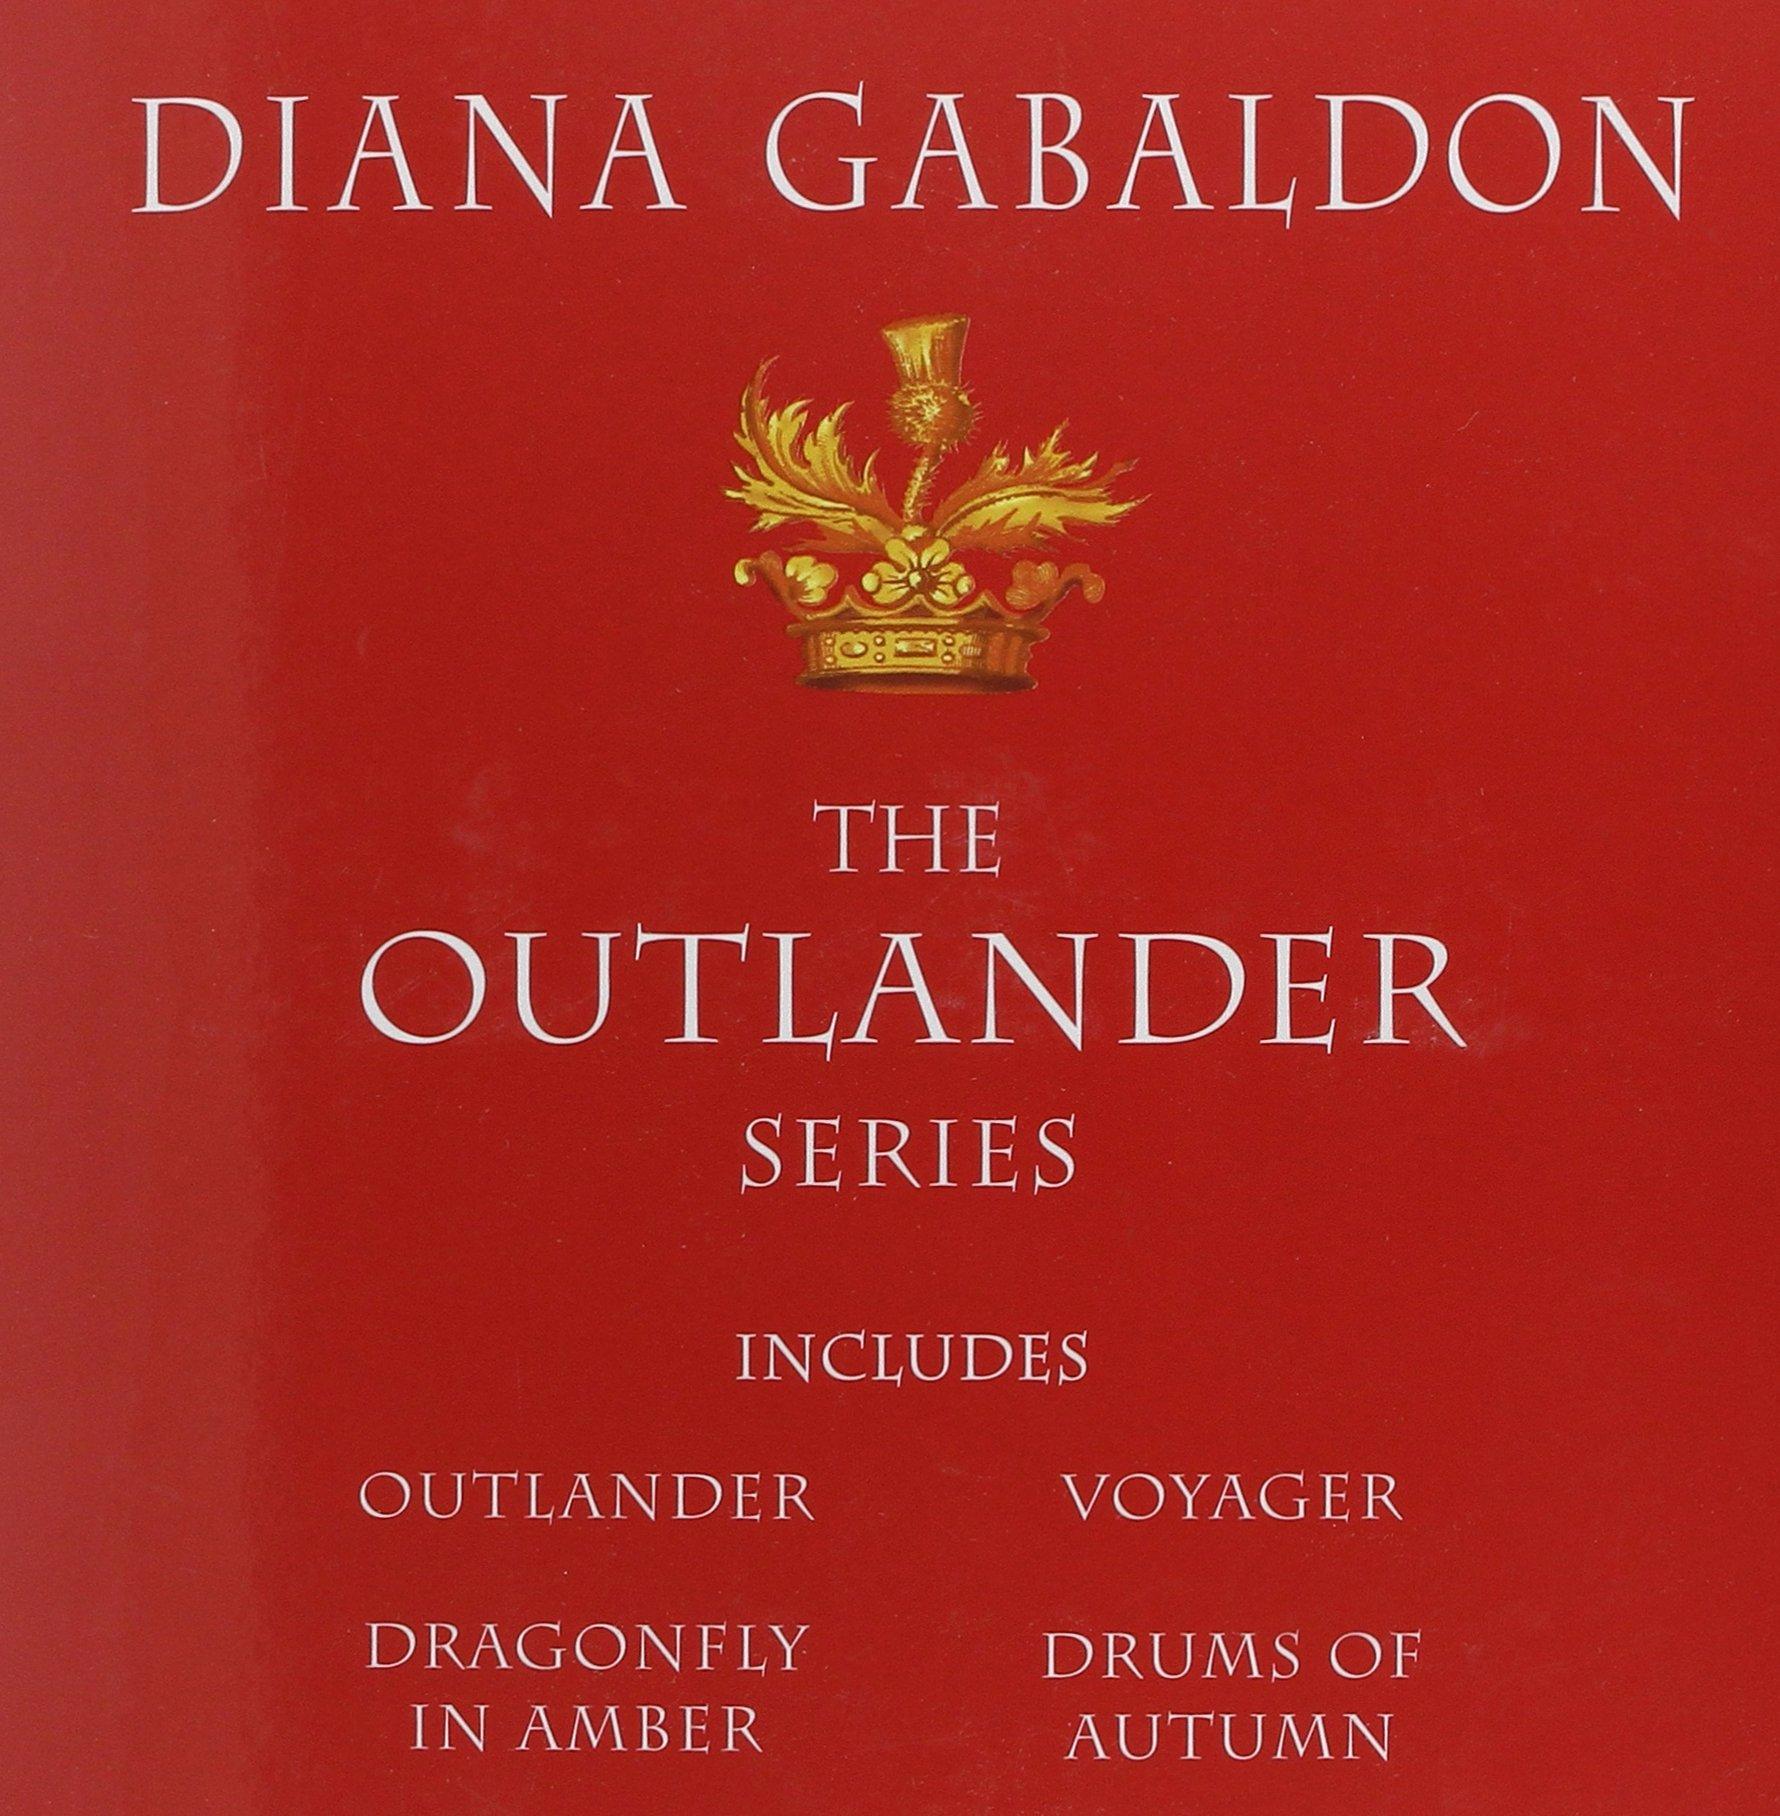 Outlander 4 copy boxed set outlander dragonfly in amber voyager outlander 4 copy boxed set outlander dragonfly in amber voyager drums of autumn diana gabaldon 9781101887486 amazon books fandeluxe Gallery